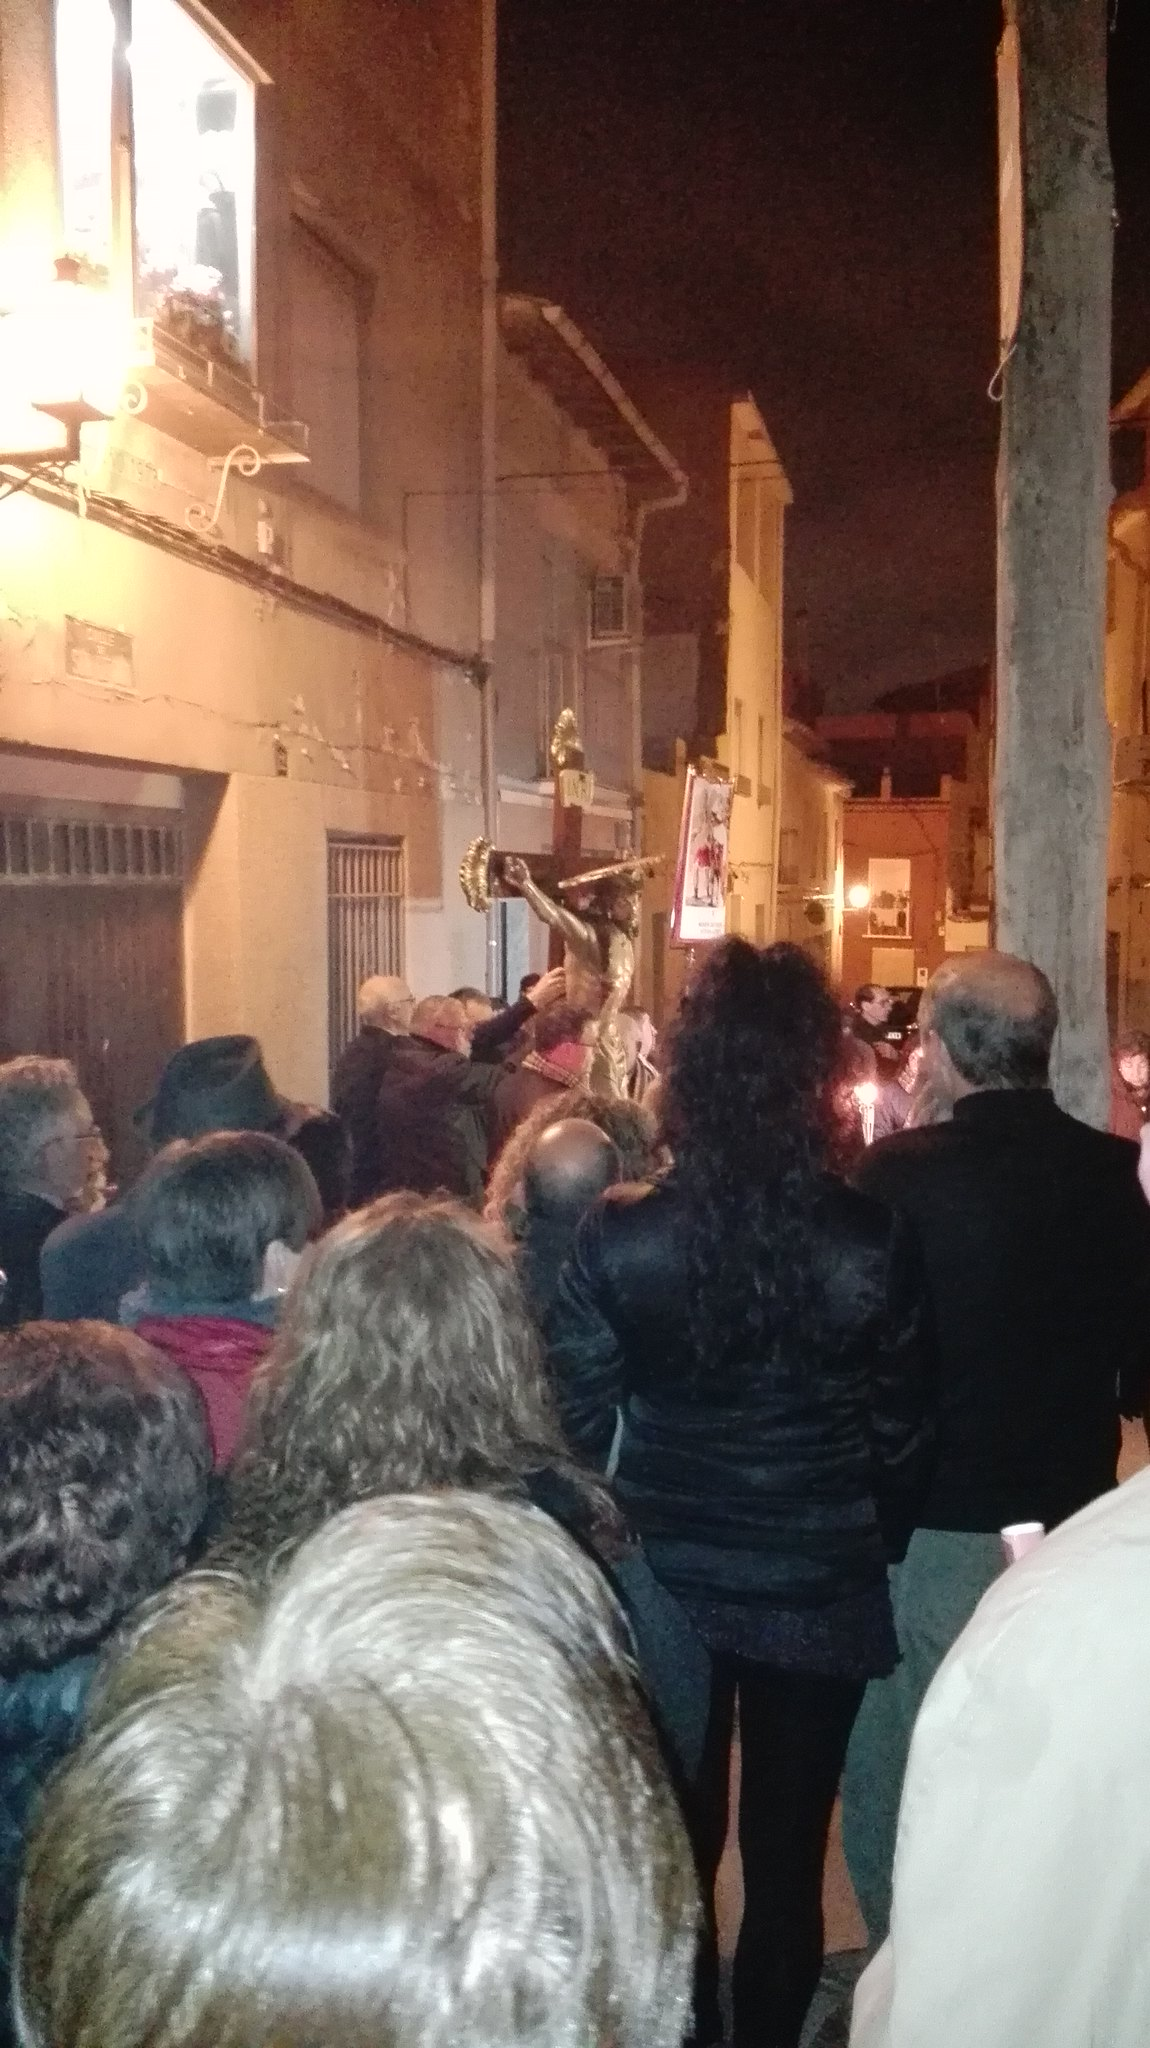 (2016-03-18) - VII Vía Crucis nocturno - Javier Romero Ripoll (011)